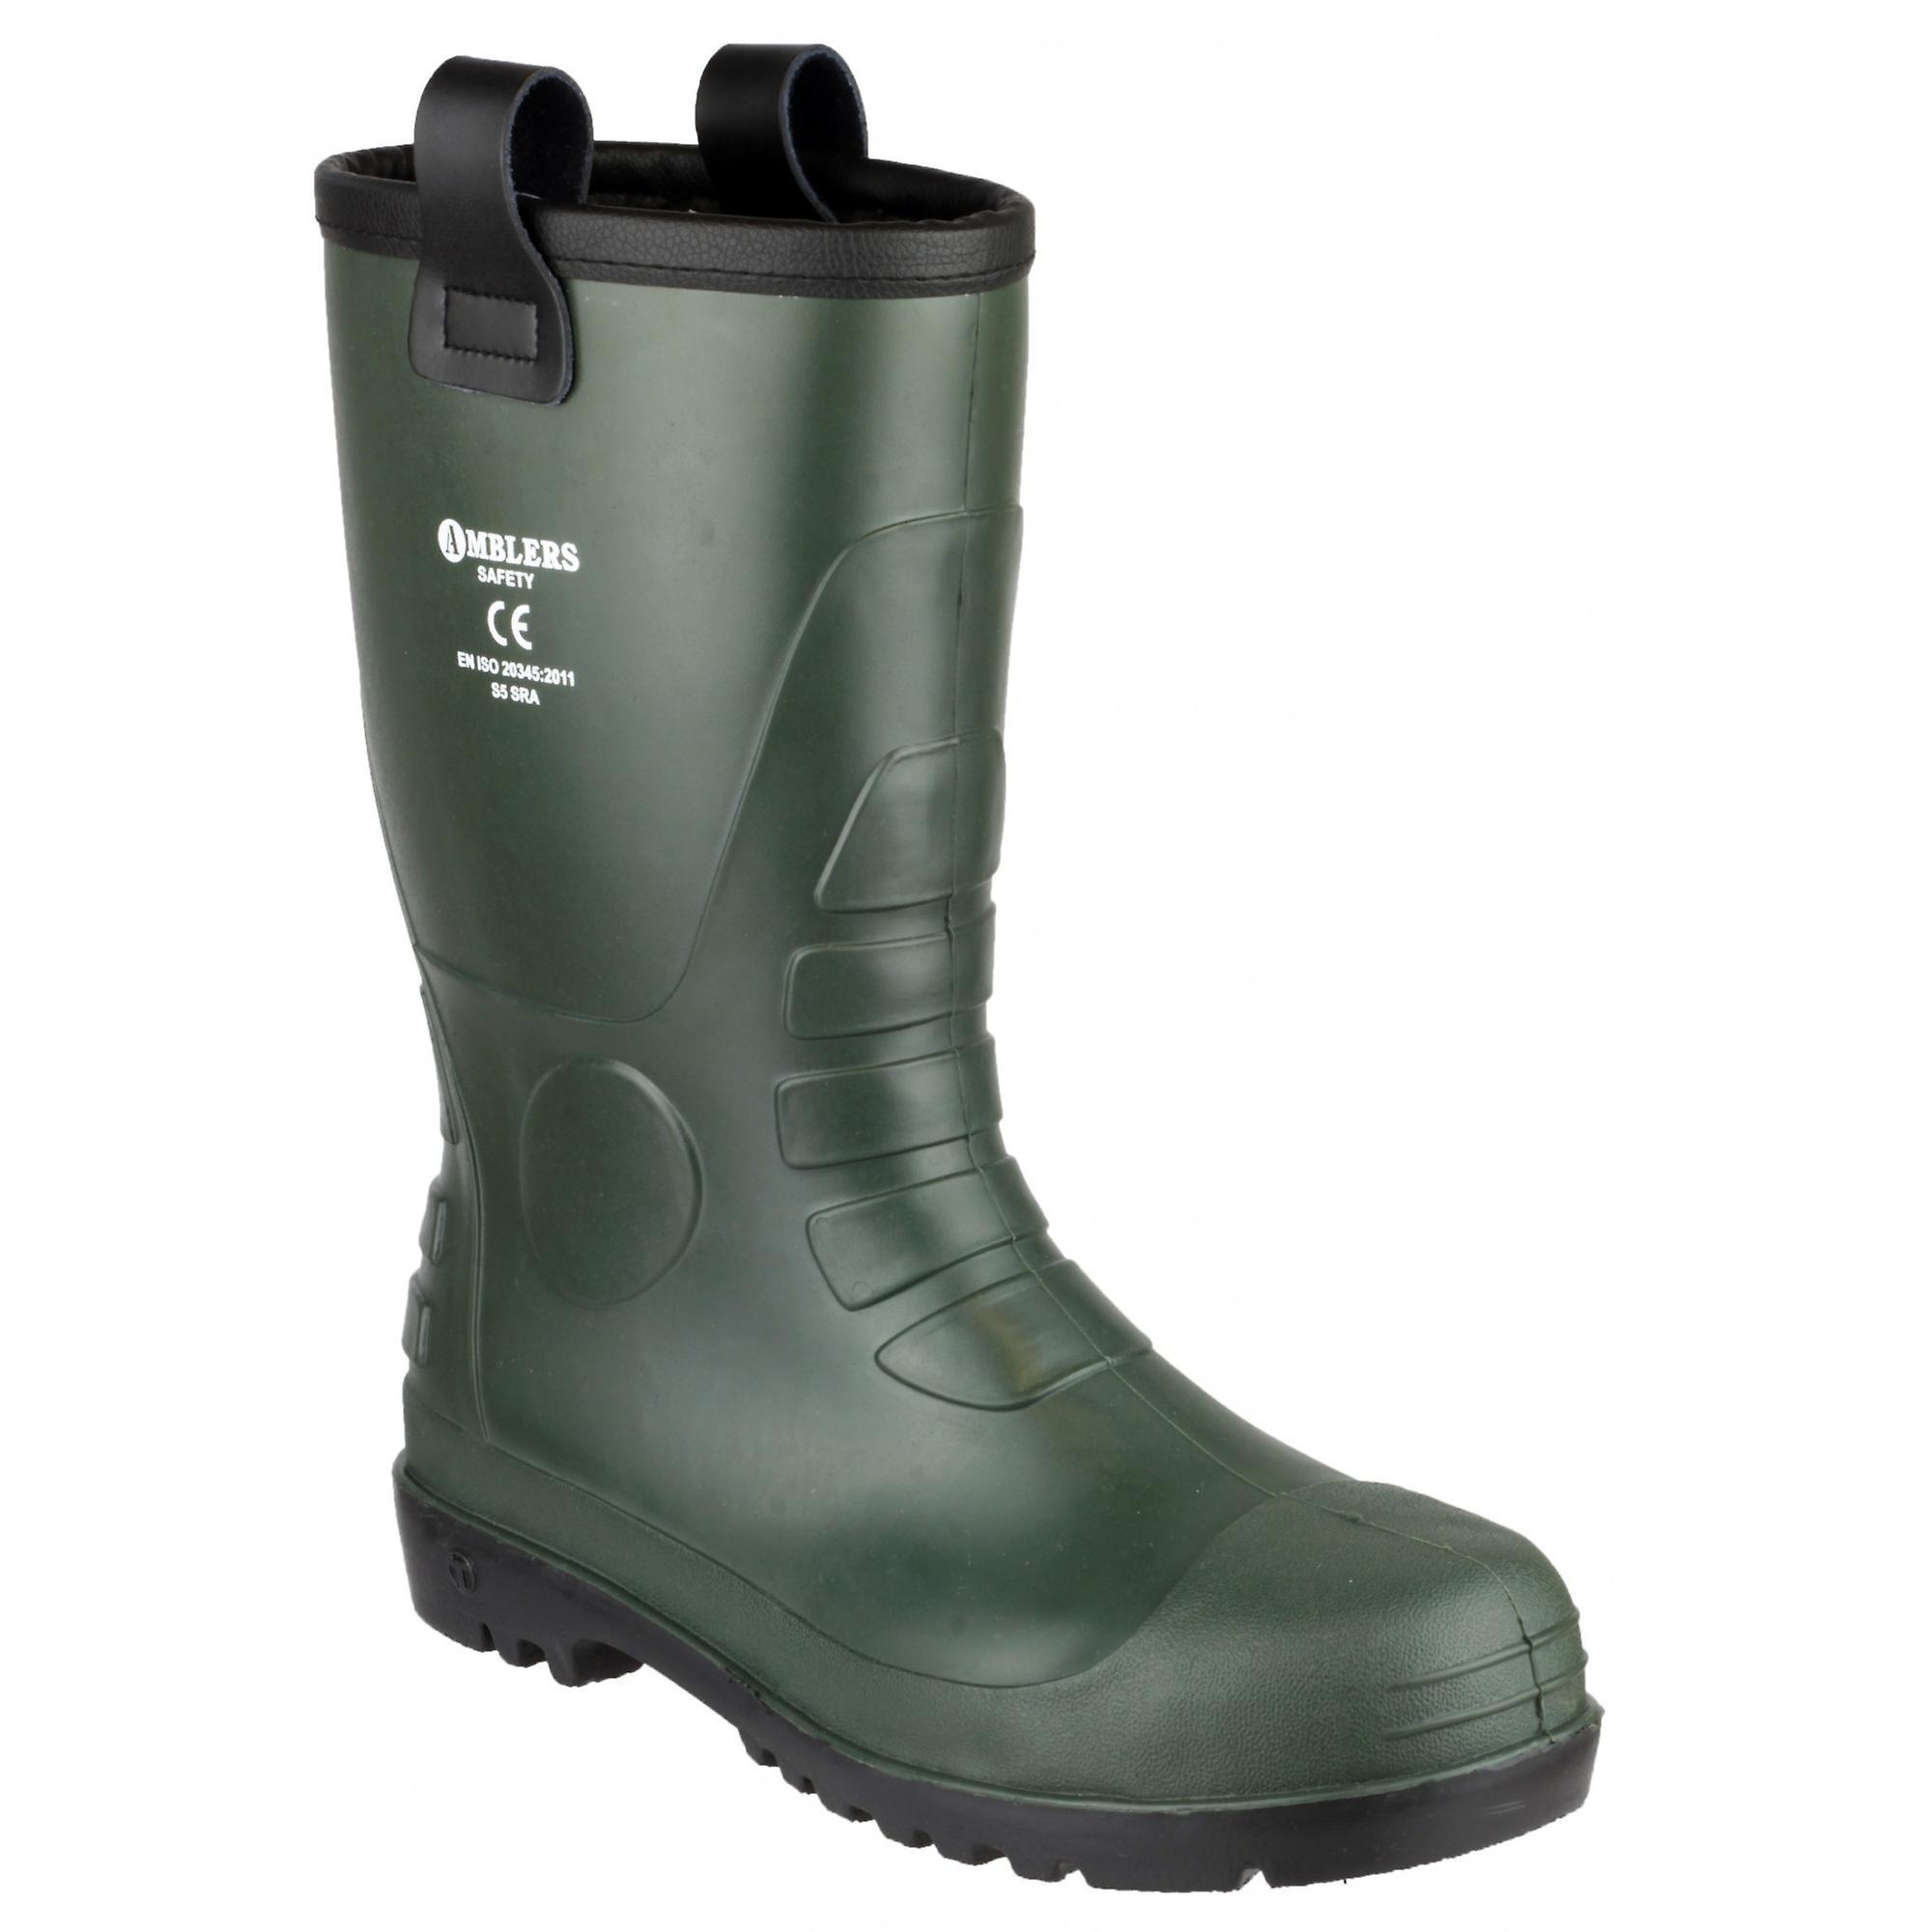 Footsure 97 PVC Rigger Safety Wellingtons     Mens stivali | Apparenza Estetica  | Scolaro/Signora Scarpa  d48460